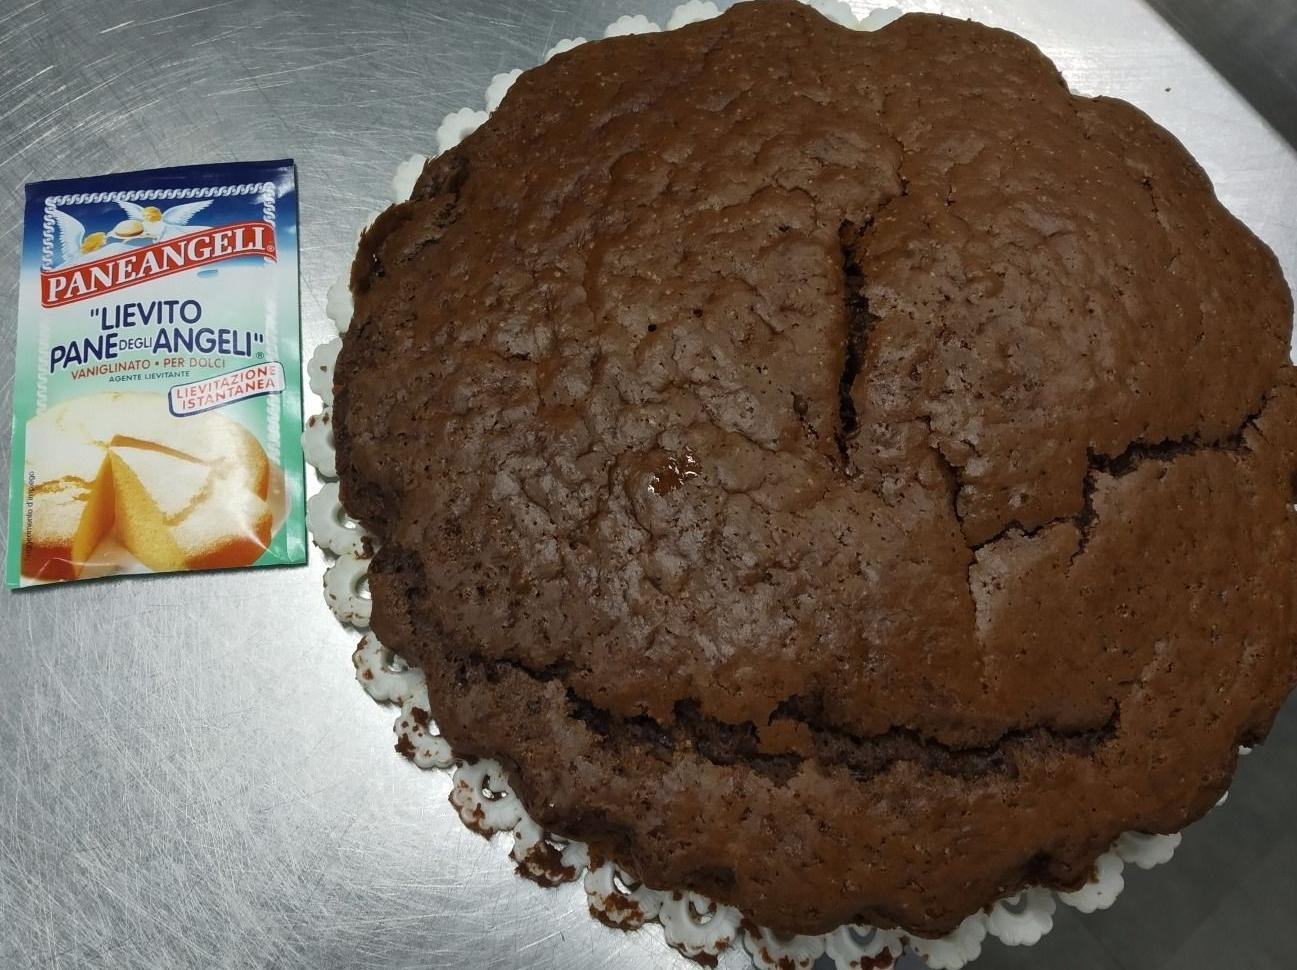 Ricetta Dolci Senza Uova.Ricetta Torta Al Cacao E Mascarpone Senza Uova Dolcidee